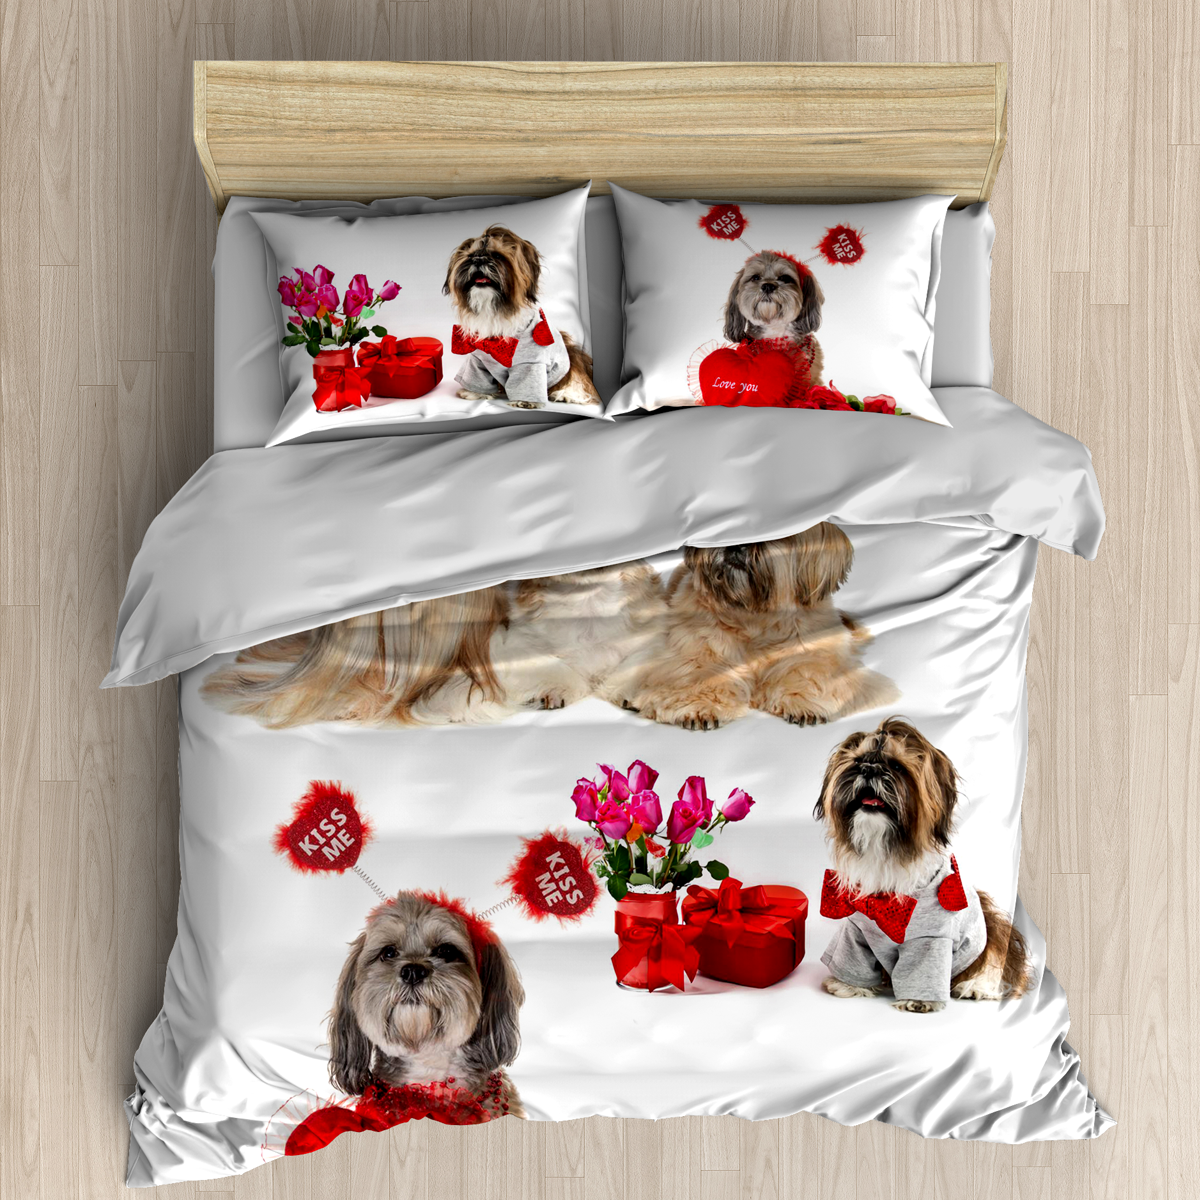 Shih tzu bedding sheet duvet cover Duvet bedding sets